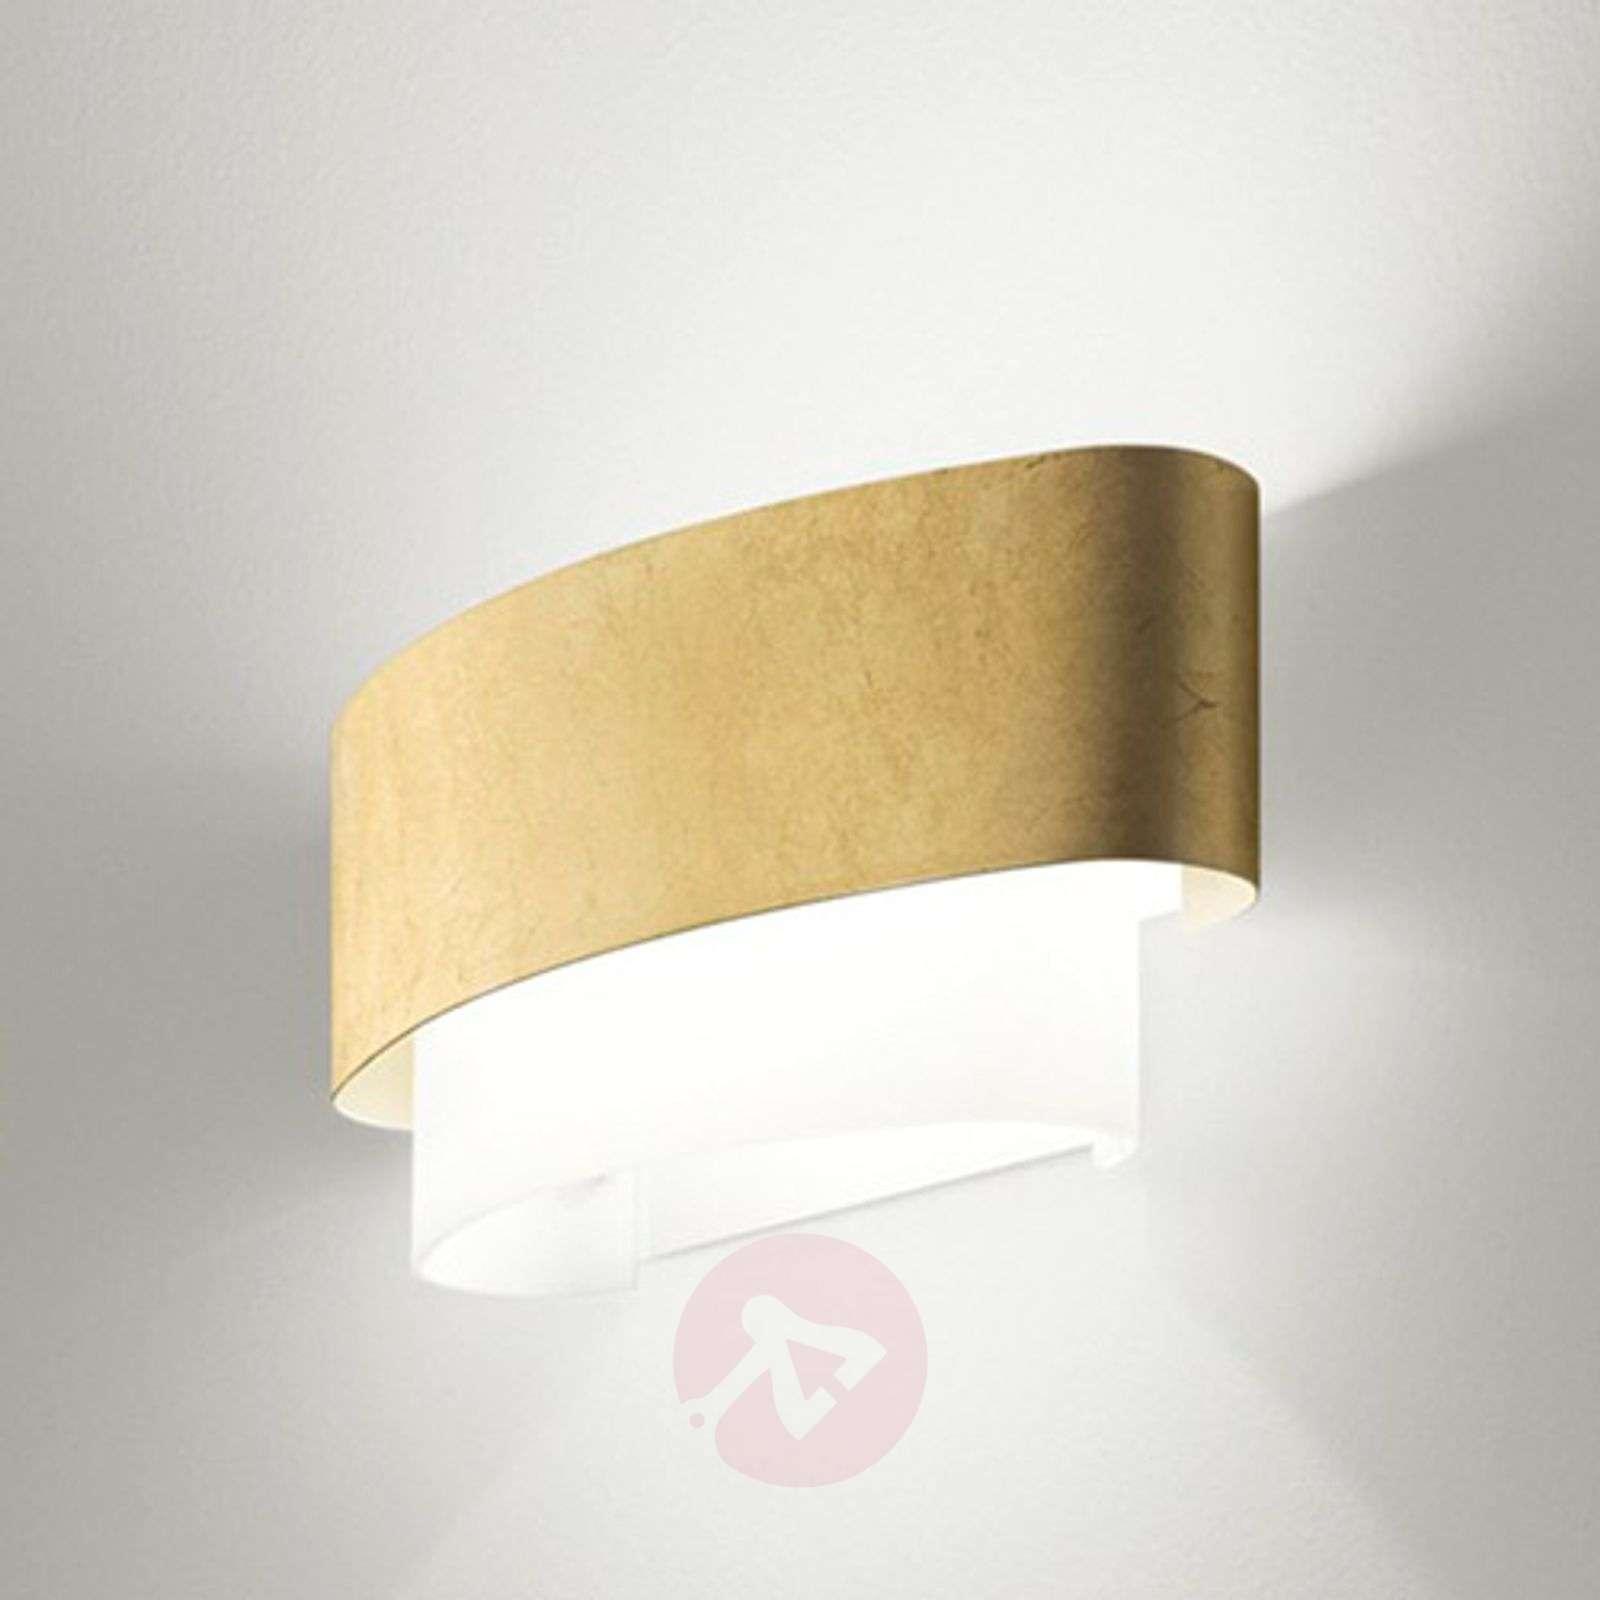 In a gold leaf look Matrioska wall light-6042268-01